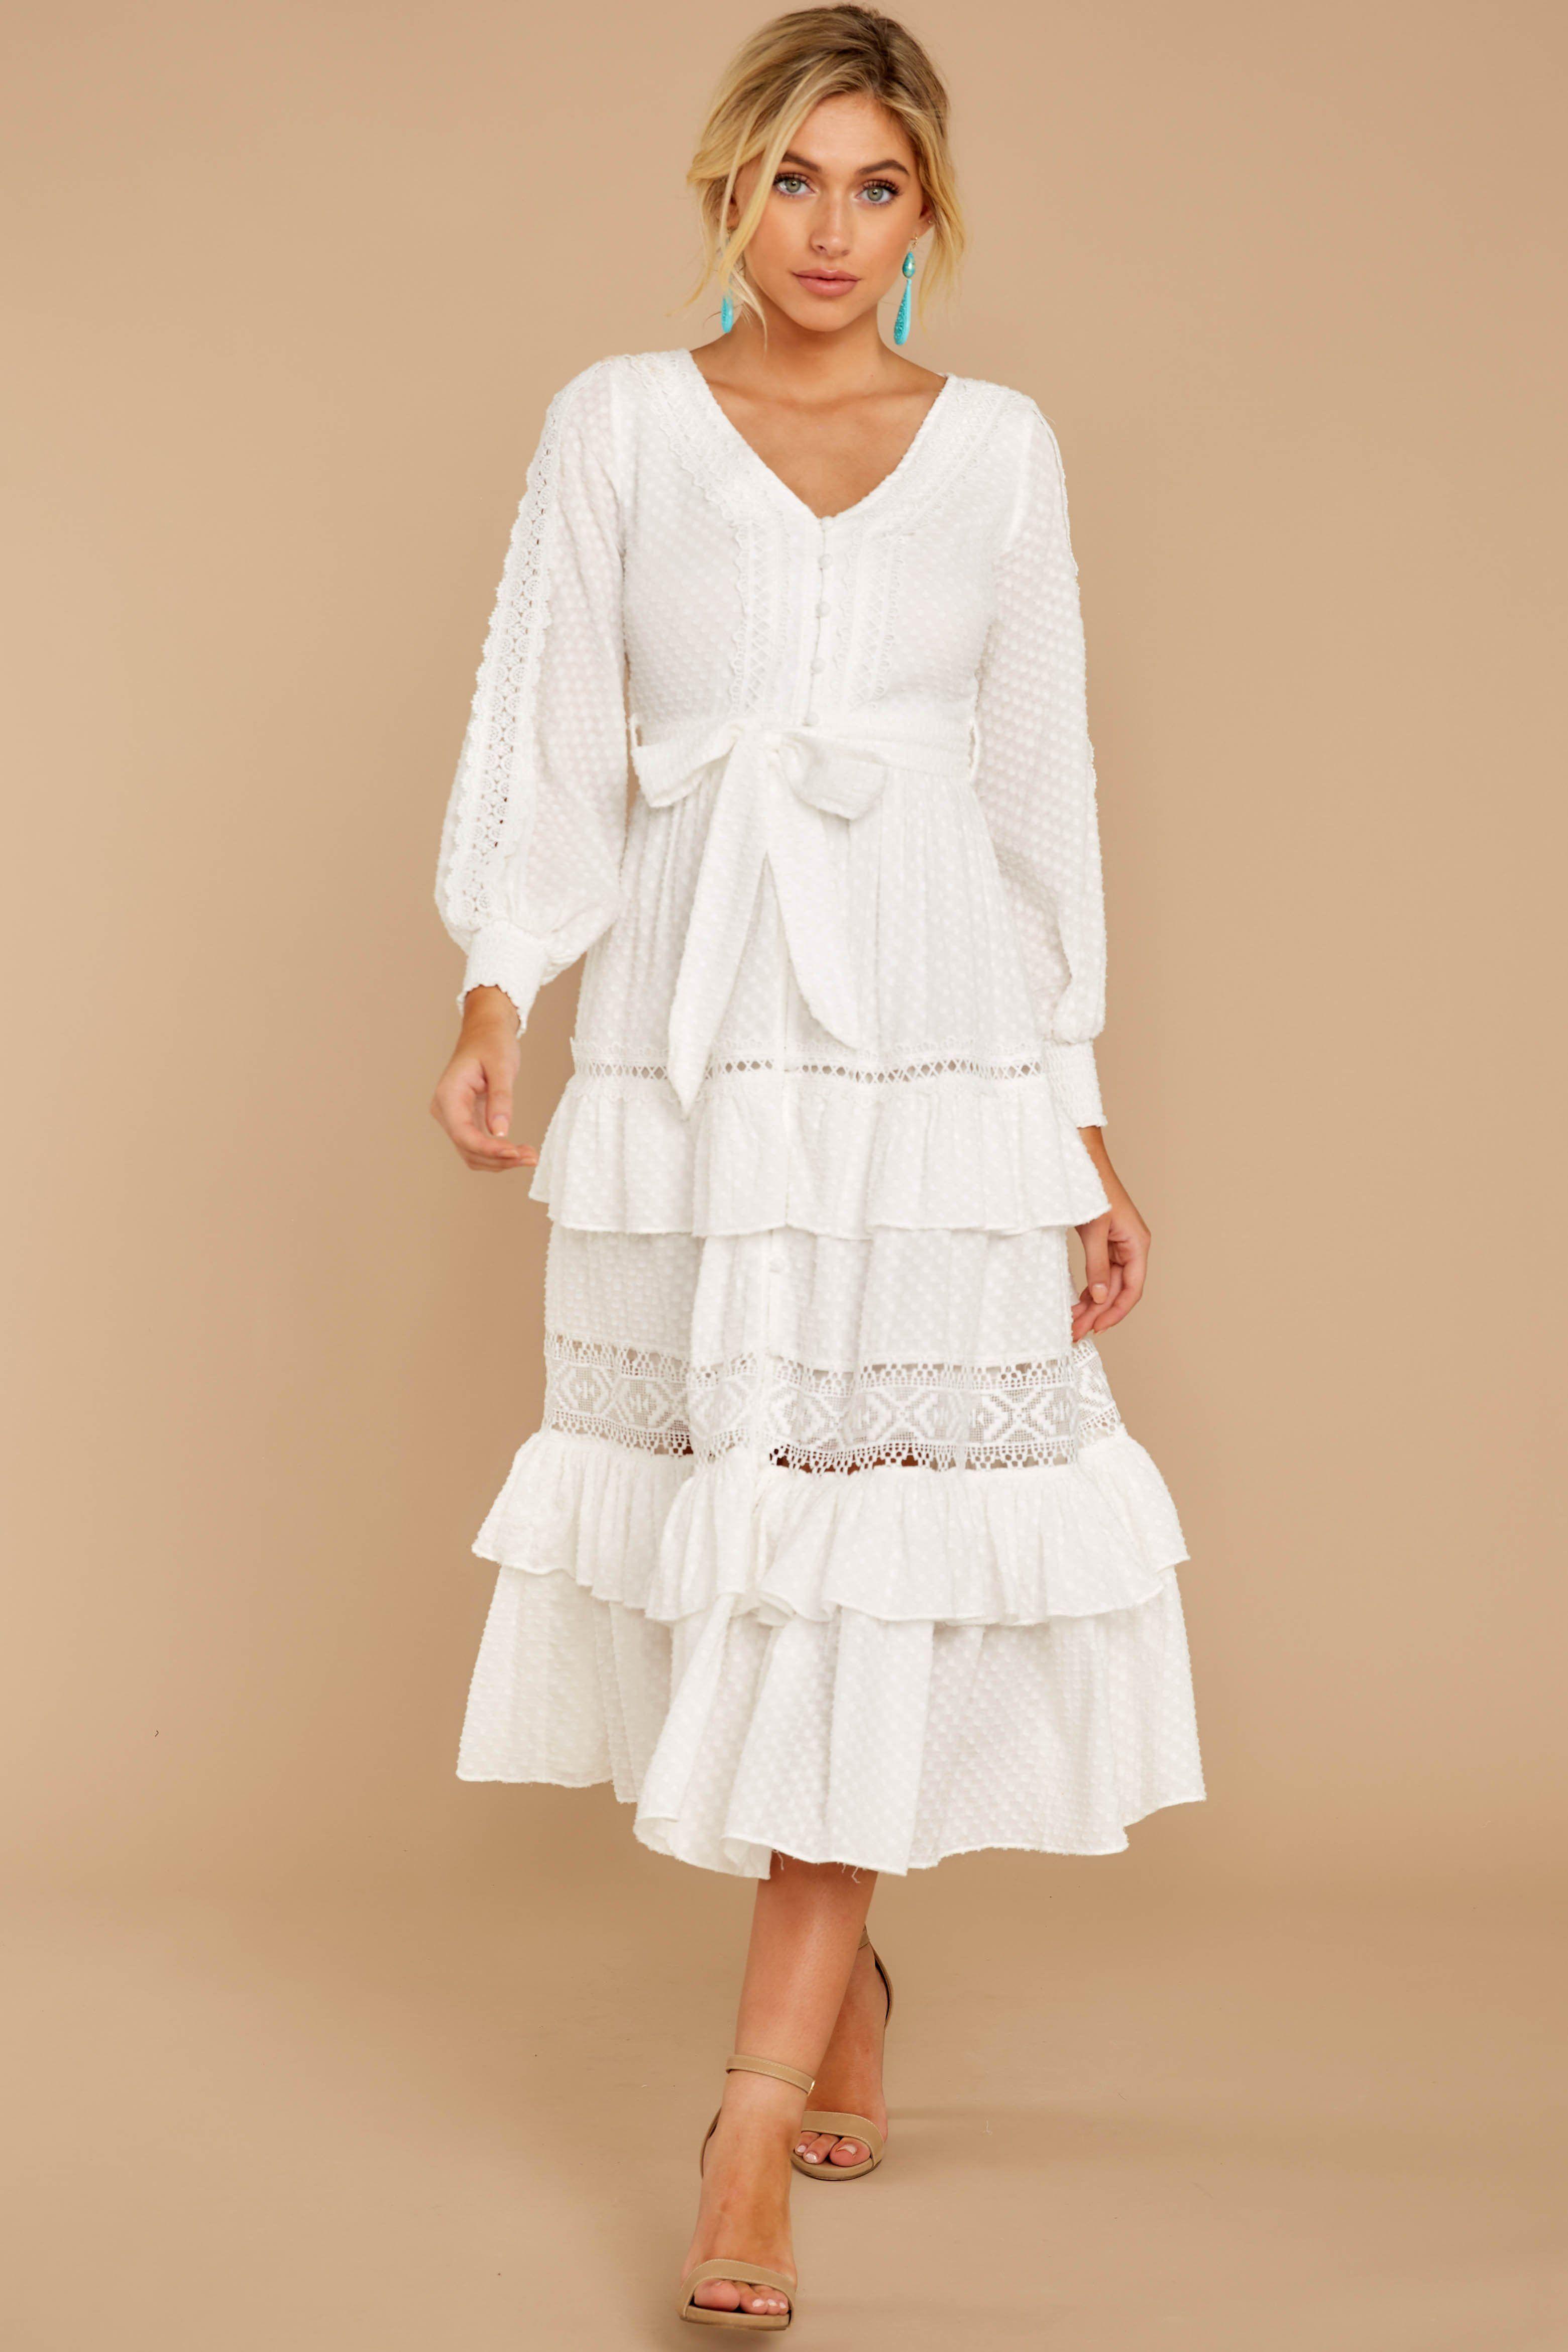 One Day Soon White Lace Midi Dress White Lace Midi Dress White Lace Maxi Dress Informal Dress [ 4683 x 3122 Pixel ]